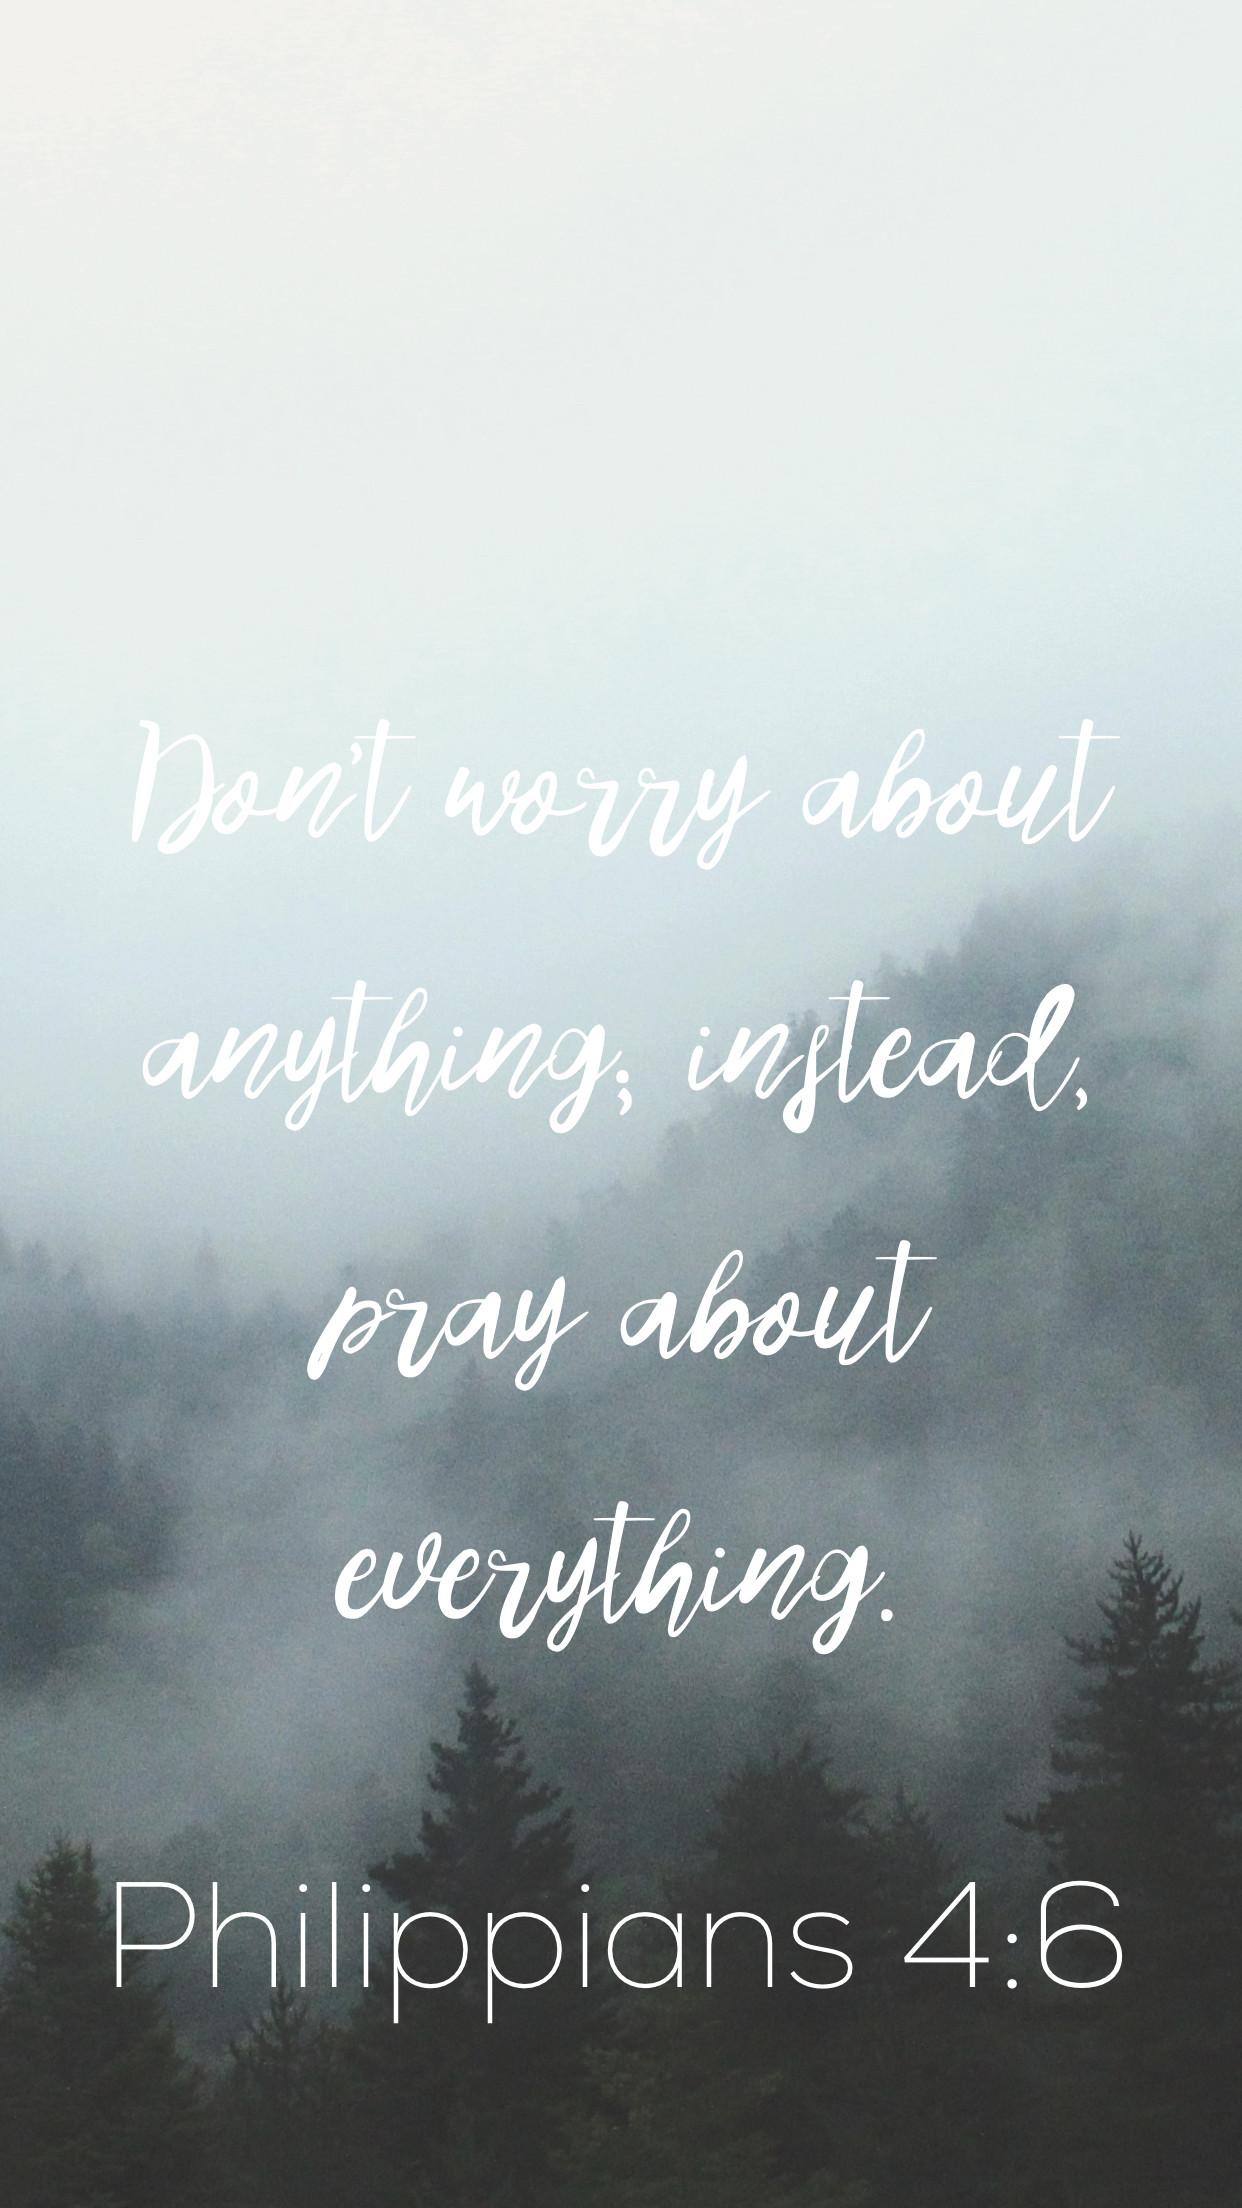 Phone wallpaper-Philippians 4:6